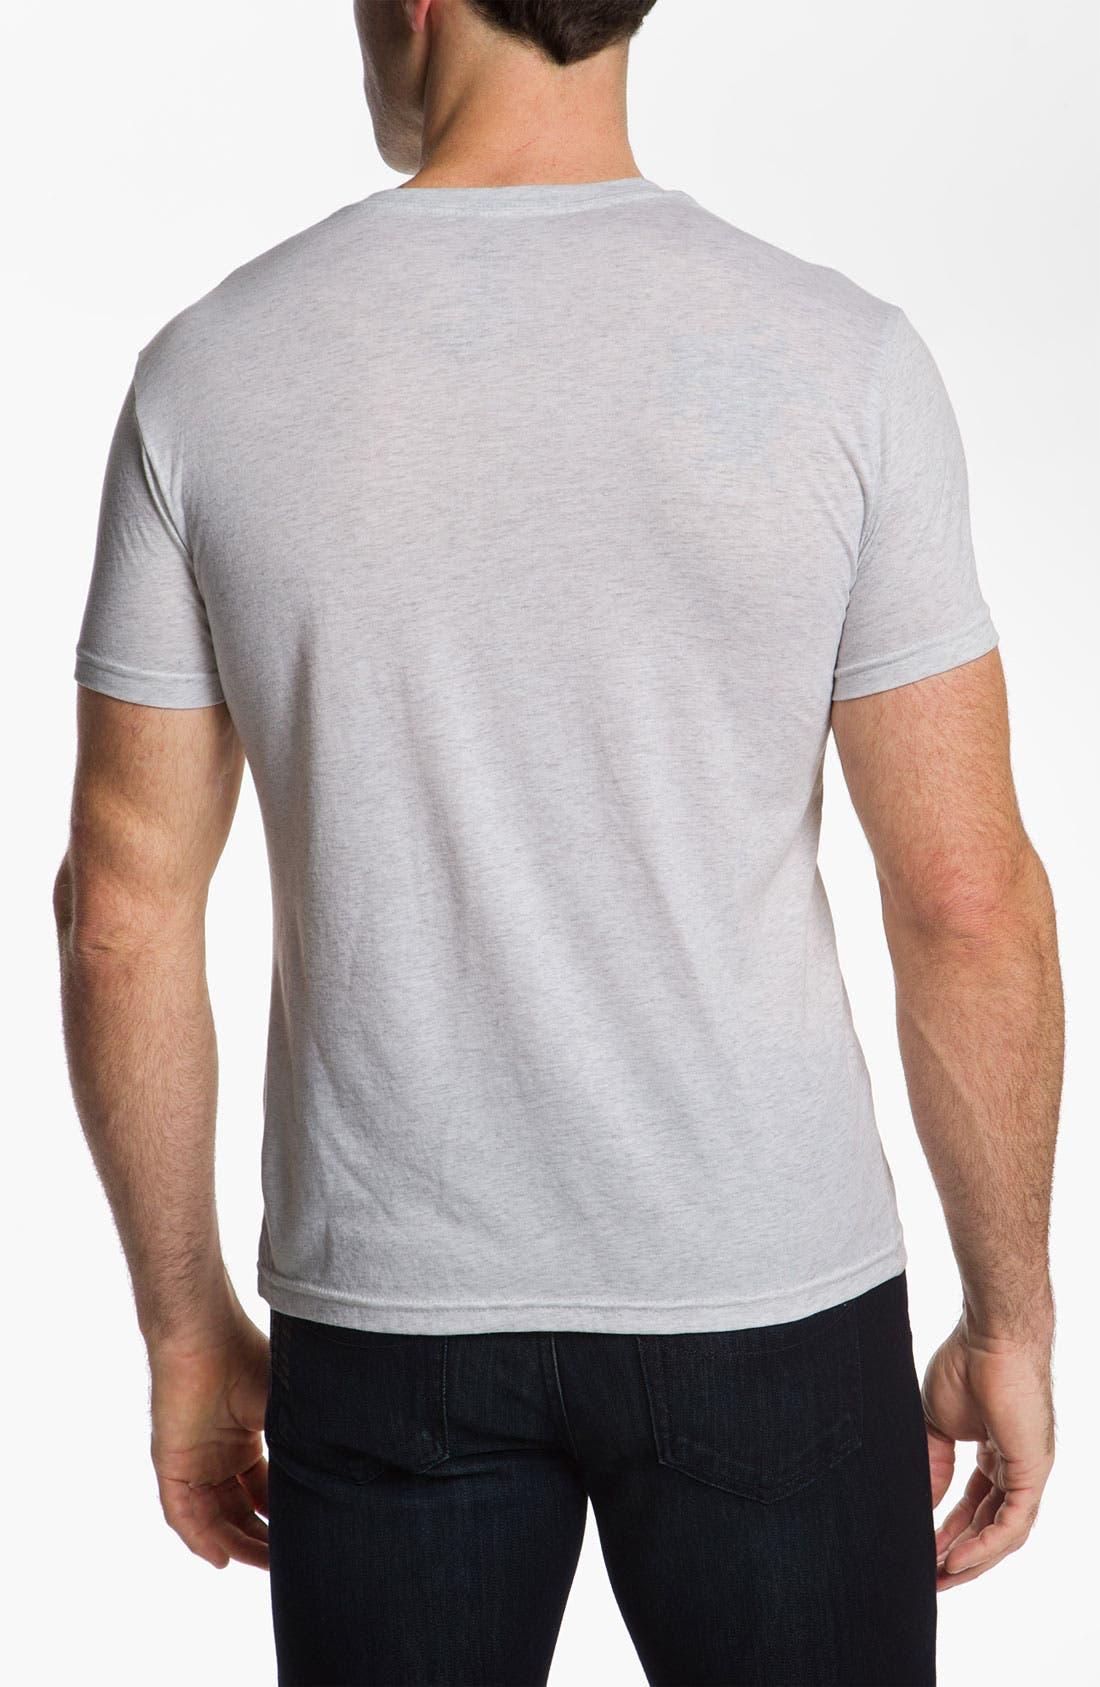 FREE AUTHORITY,                             'NASA' Graphic T-Shirt,                             Alternate thumbnail 2, color,                             100